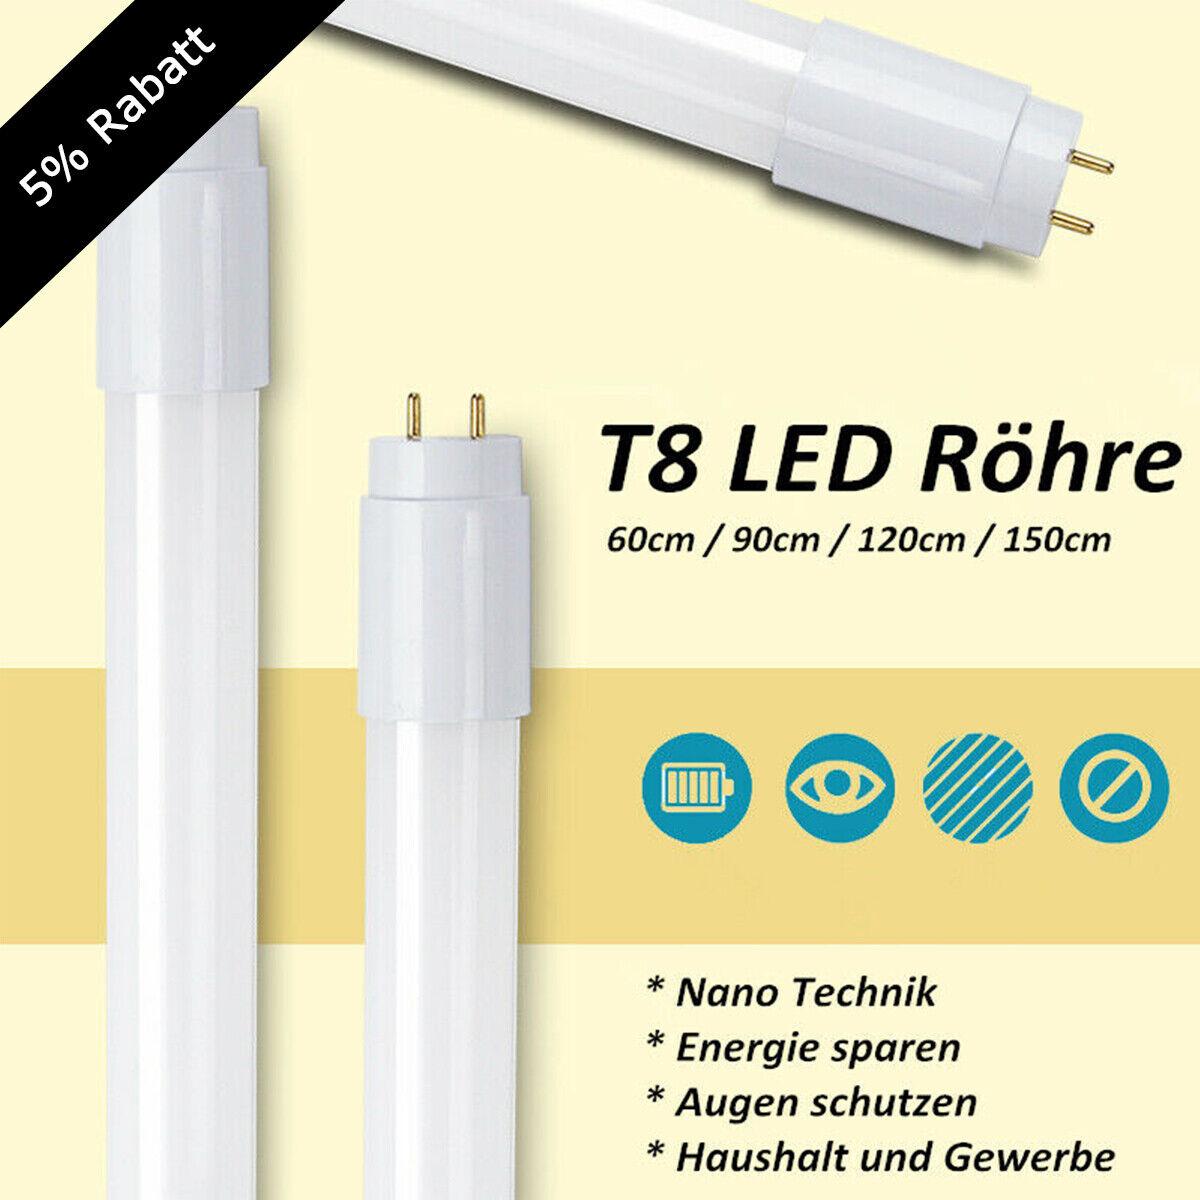 LED Röhre T8 G13  Leuchtstoffröhre 90cm 120cm 150cm Tube Neonröhre Leuchte lampe